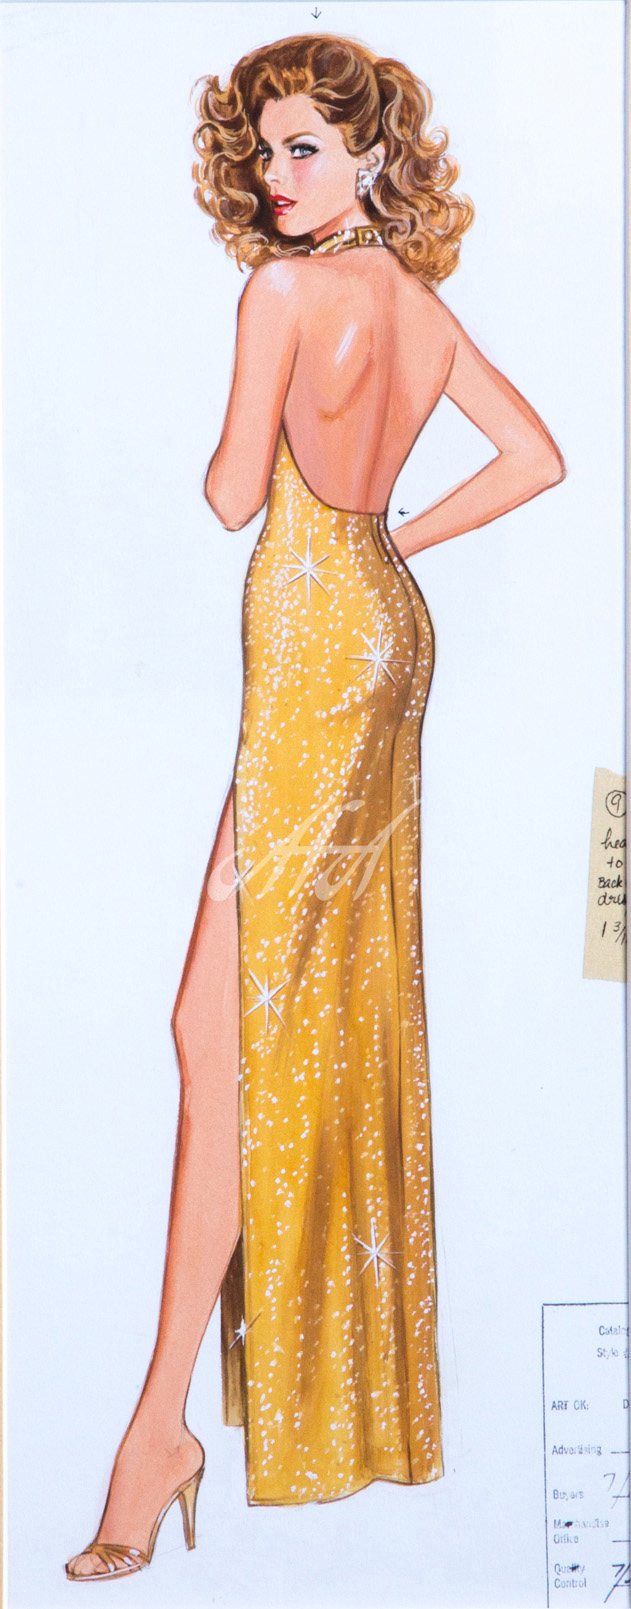 HCFM_Mellinger_ce4840_golddressback_framed LoRes watermark.jpg